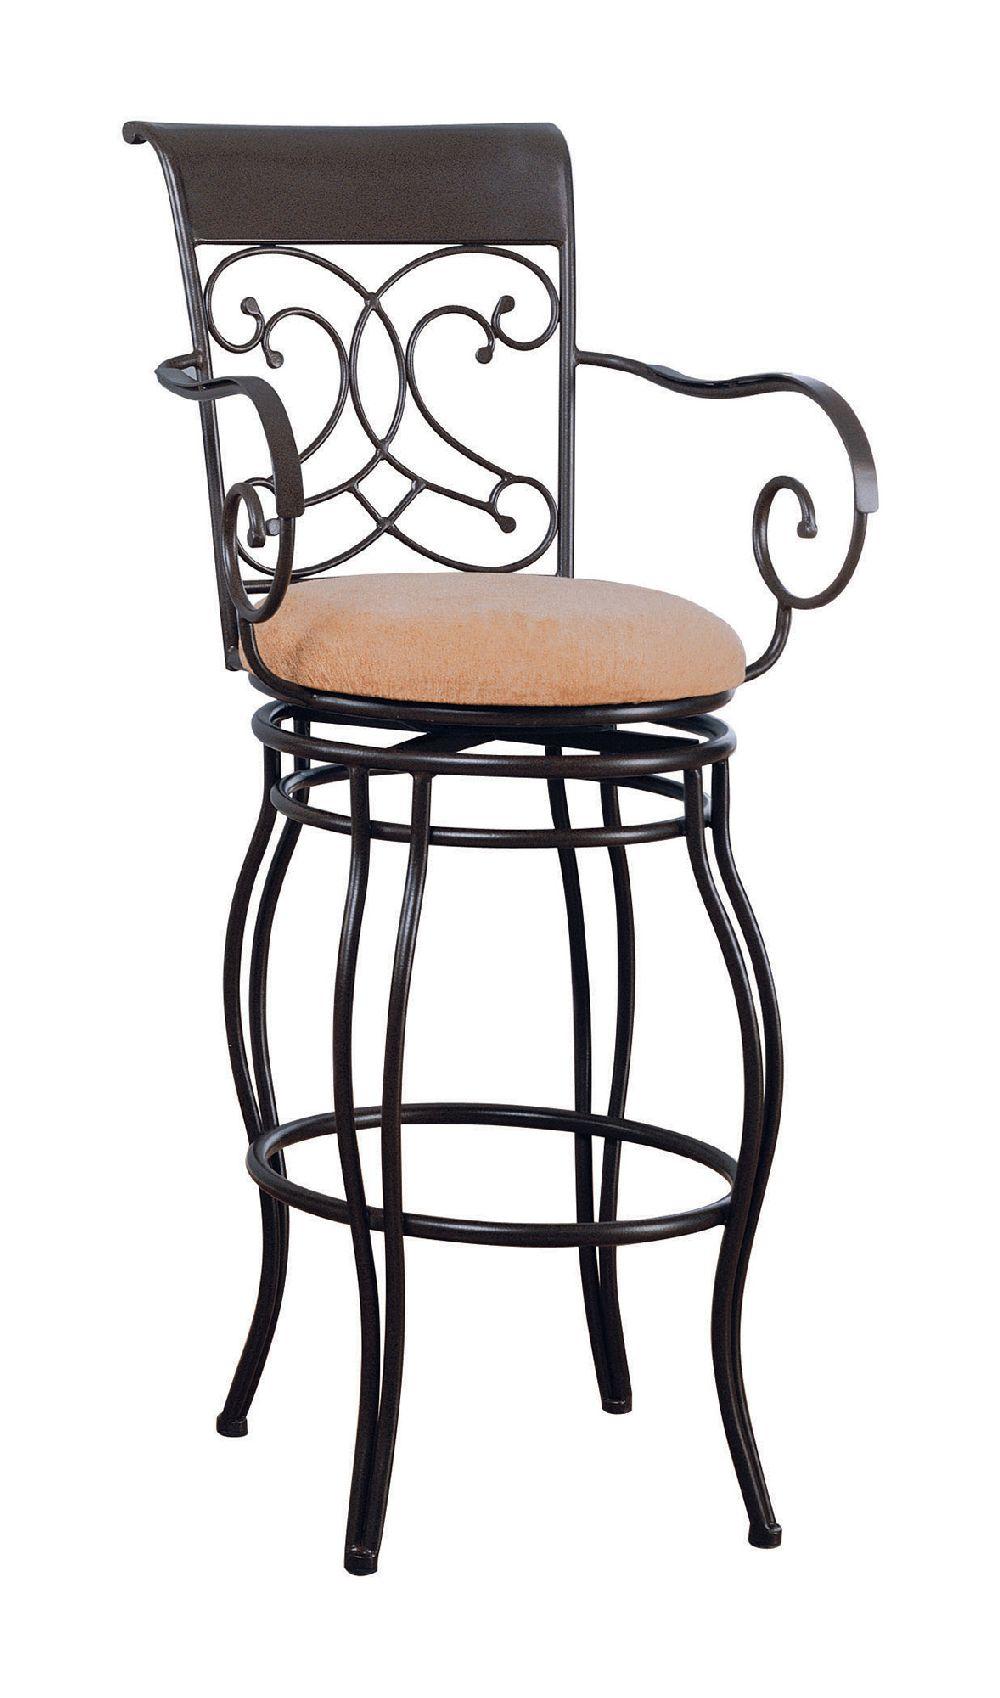 Coaster 120019 Swivel Metal And Beige Fabric Bar Stool